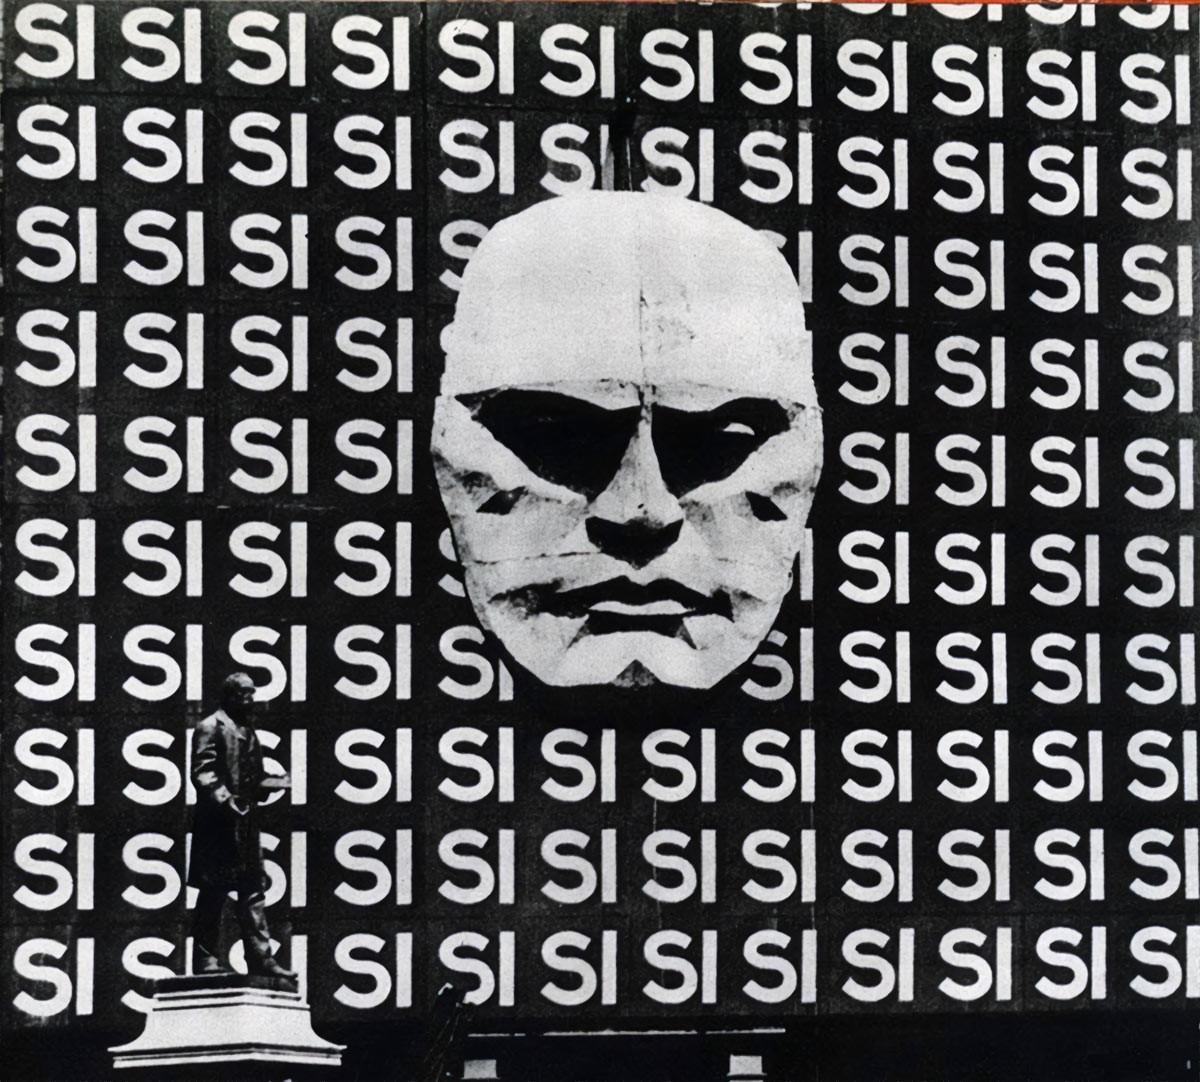 Fascist Propaganda in Advertising Communication in Italy